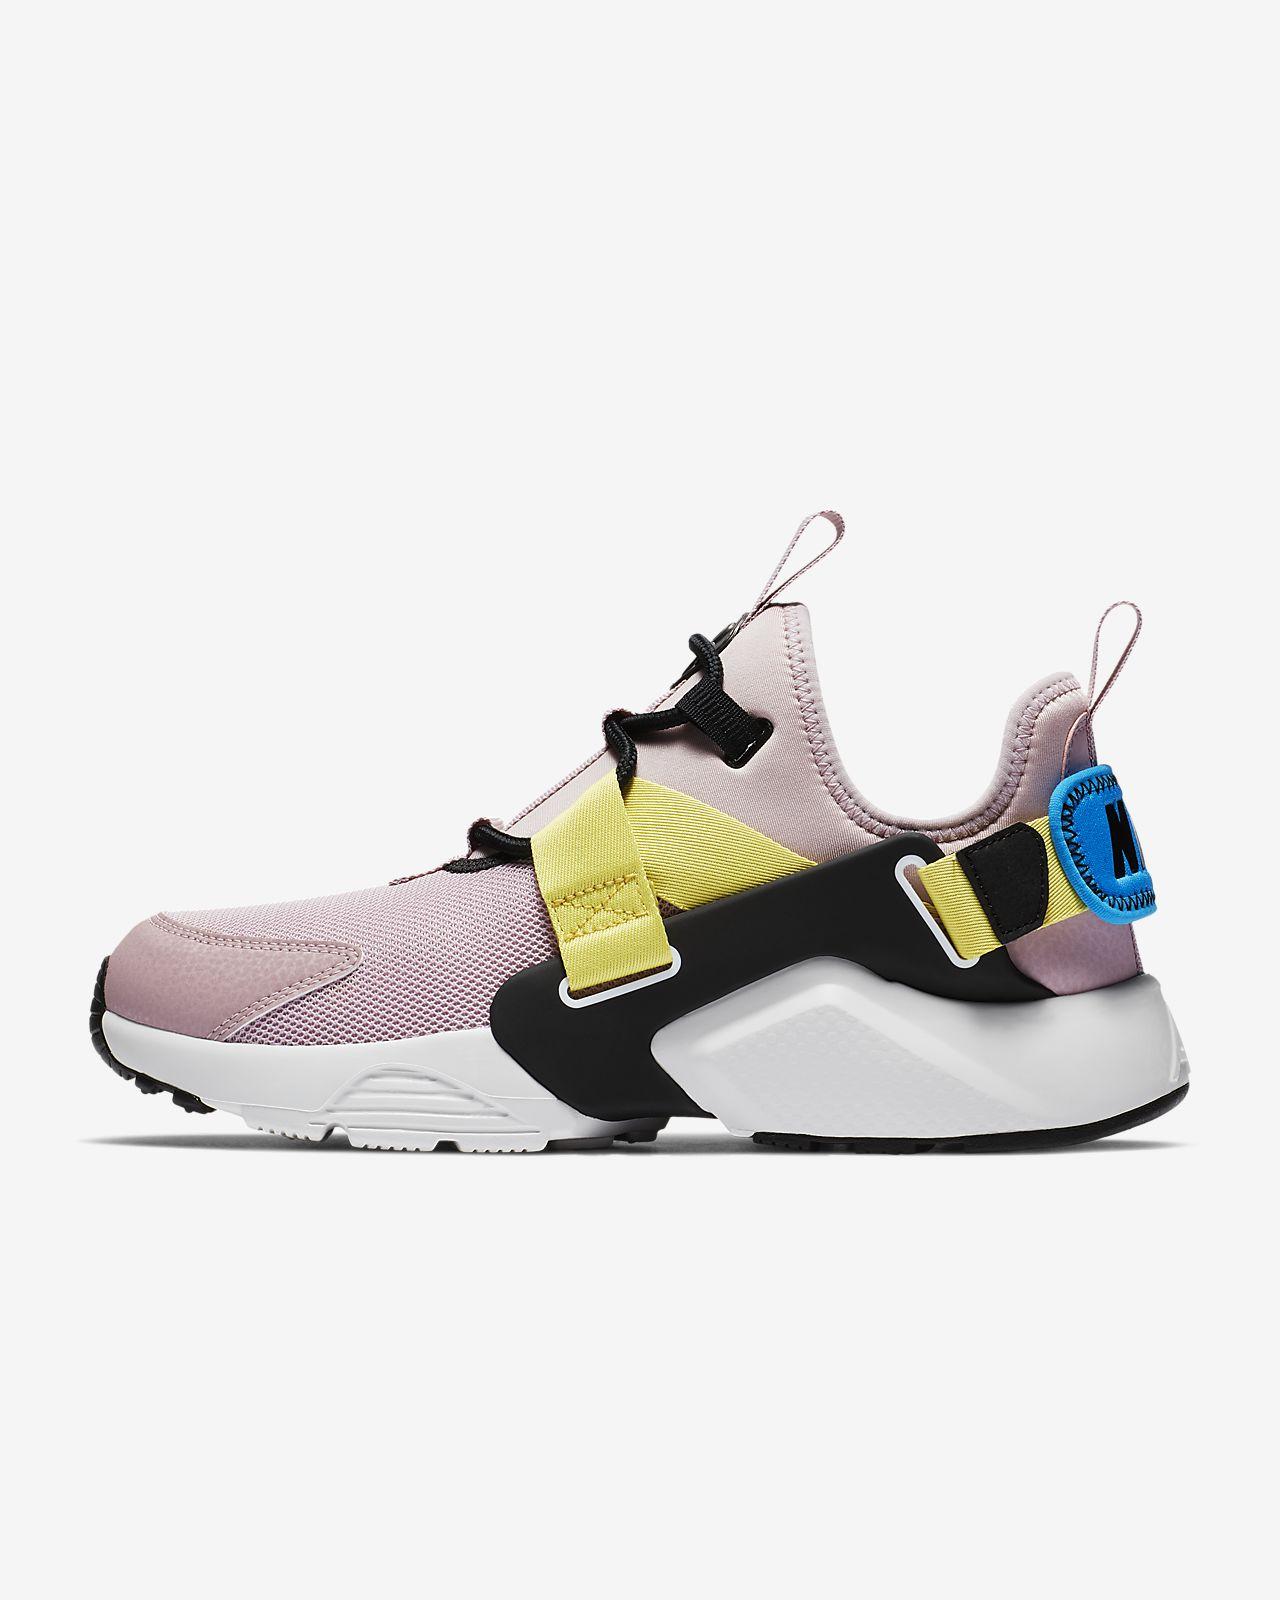 best cheap 9ce40 00410 ... Nike Air Huarache City Low Womens Shoe